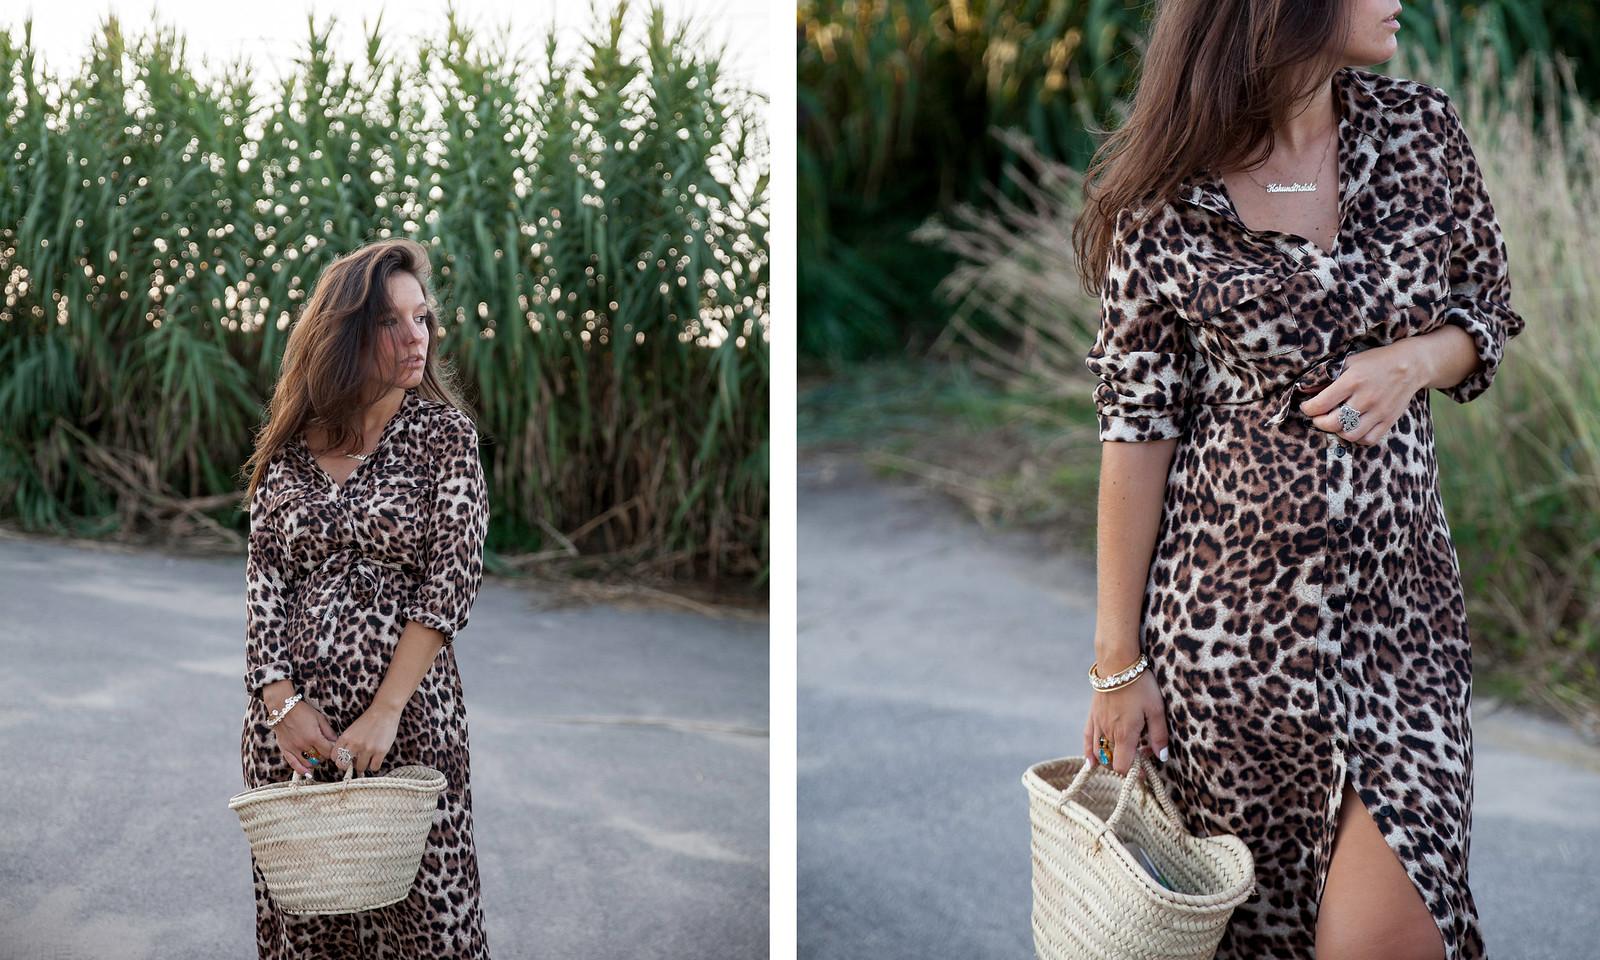 04_leopardo_estampado_tendencia_otoño_18_19_theguestgirl_leopard_dress_loavies_pregnant_barcelona_embarazada_influencer_outfit_otoño